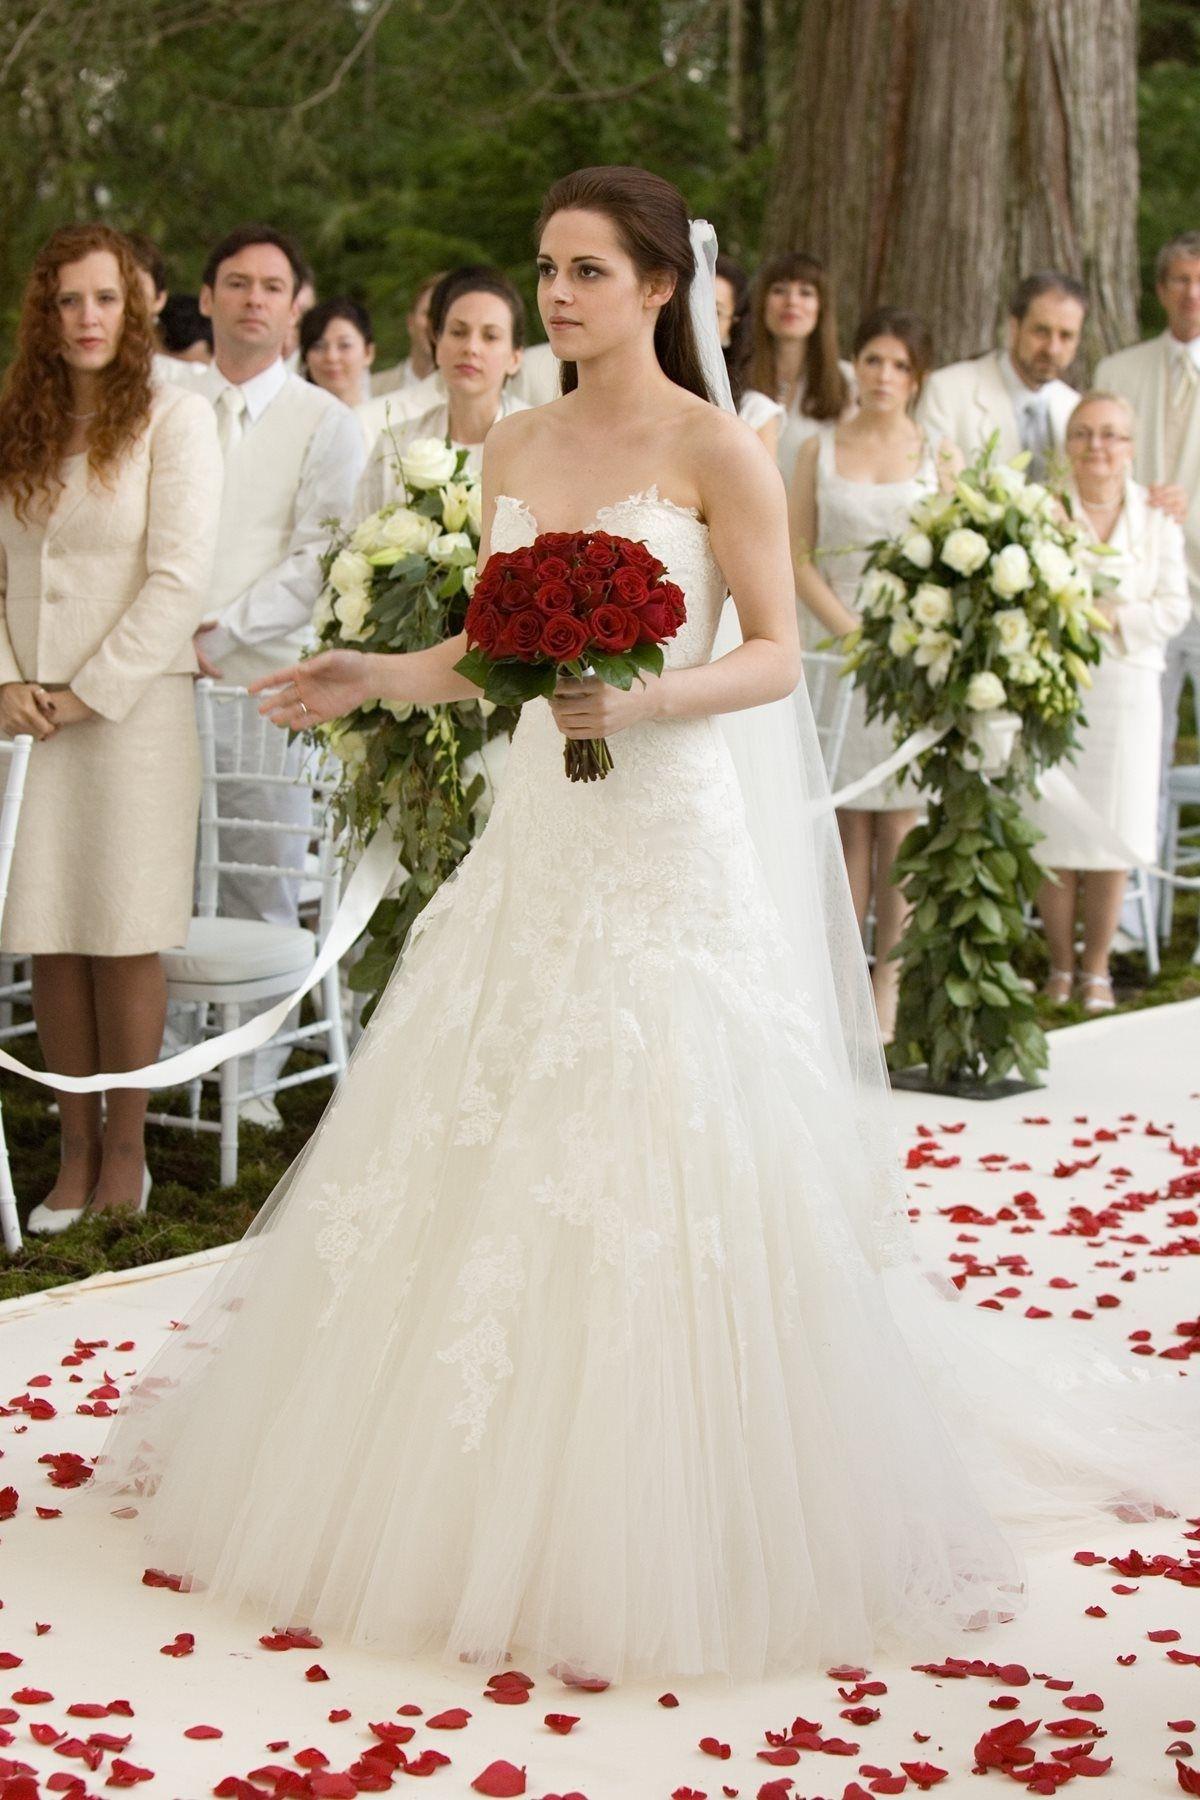 Bella's wedding dress in breaking dawn  Bella Swan Wedding Dress In Her Dream  Coisas belas da vida